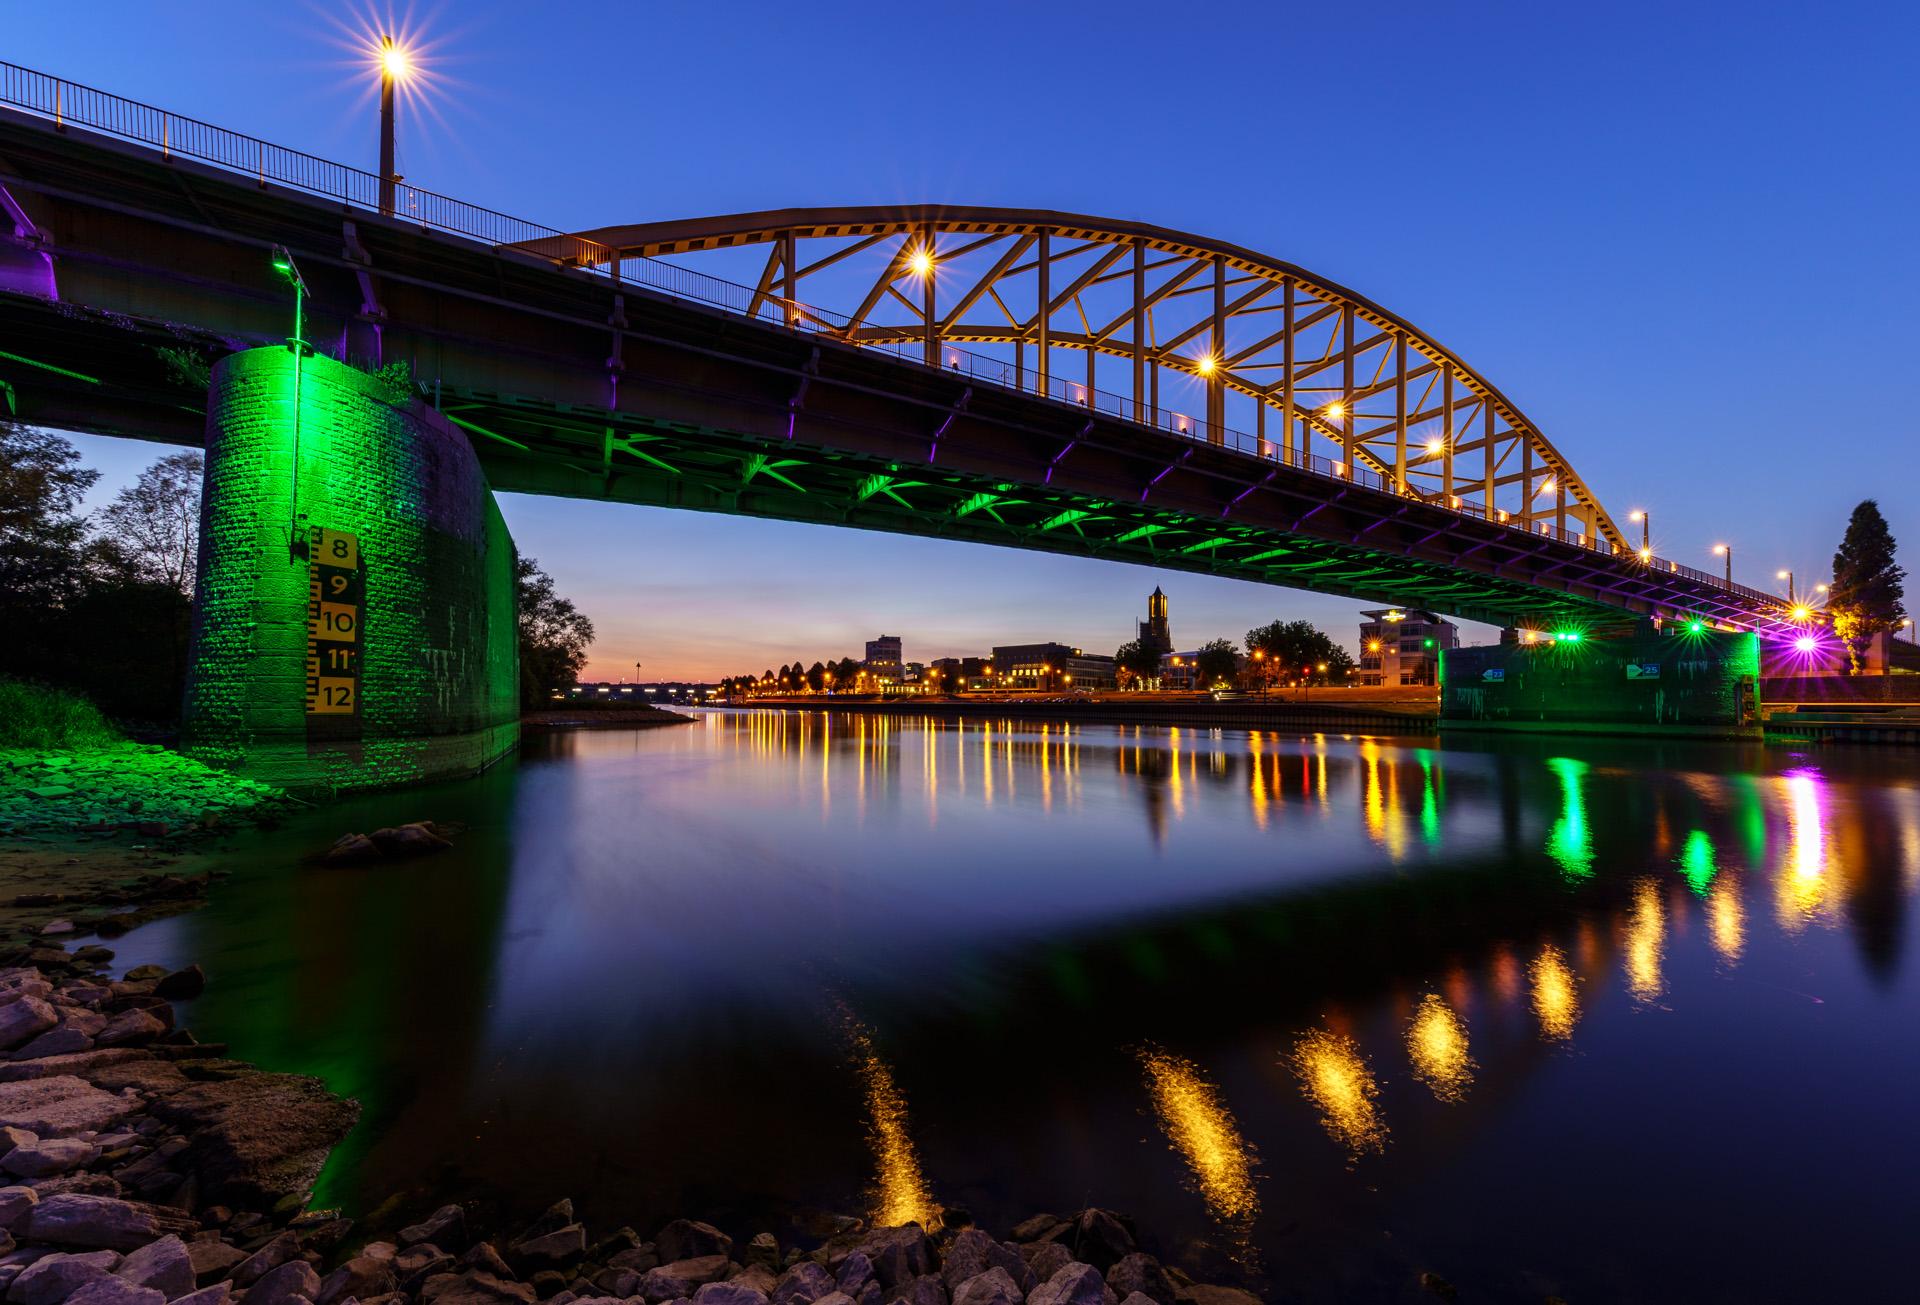 Sony A7III, Avondfotografie Arnhem, John Frostbrug